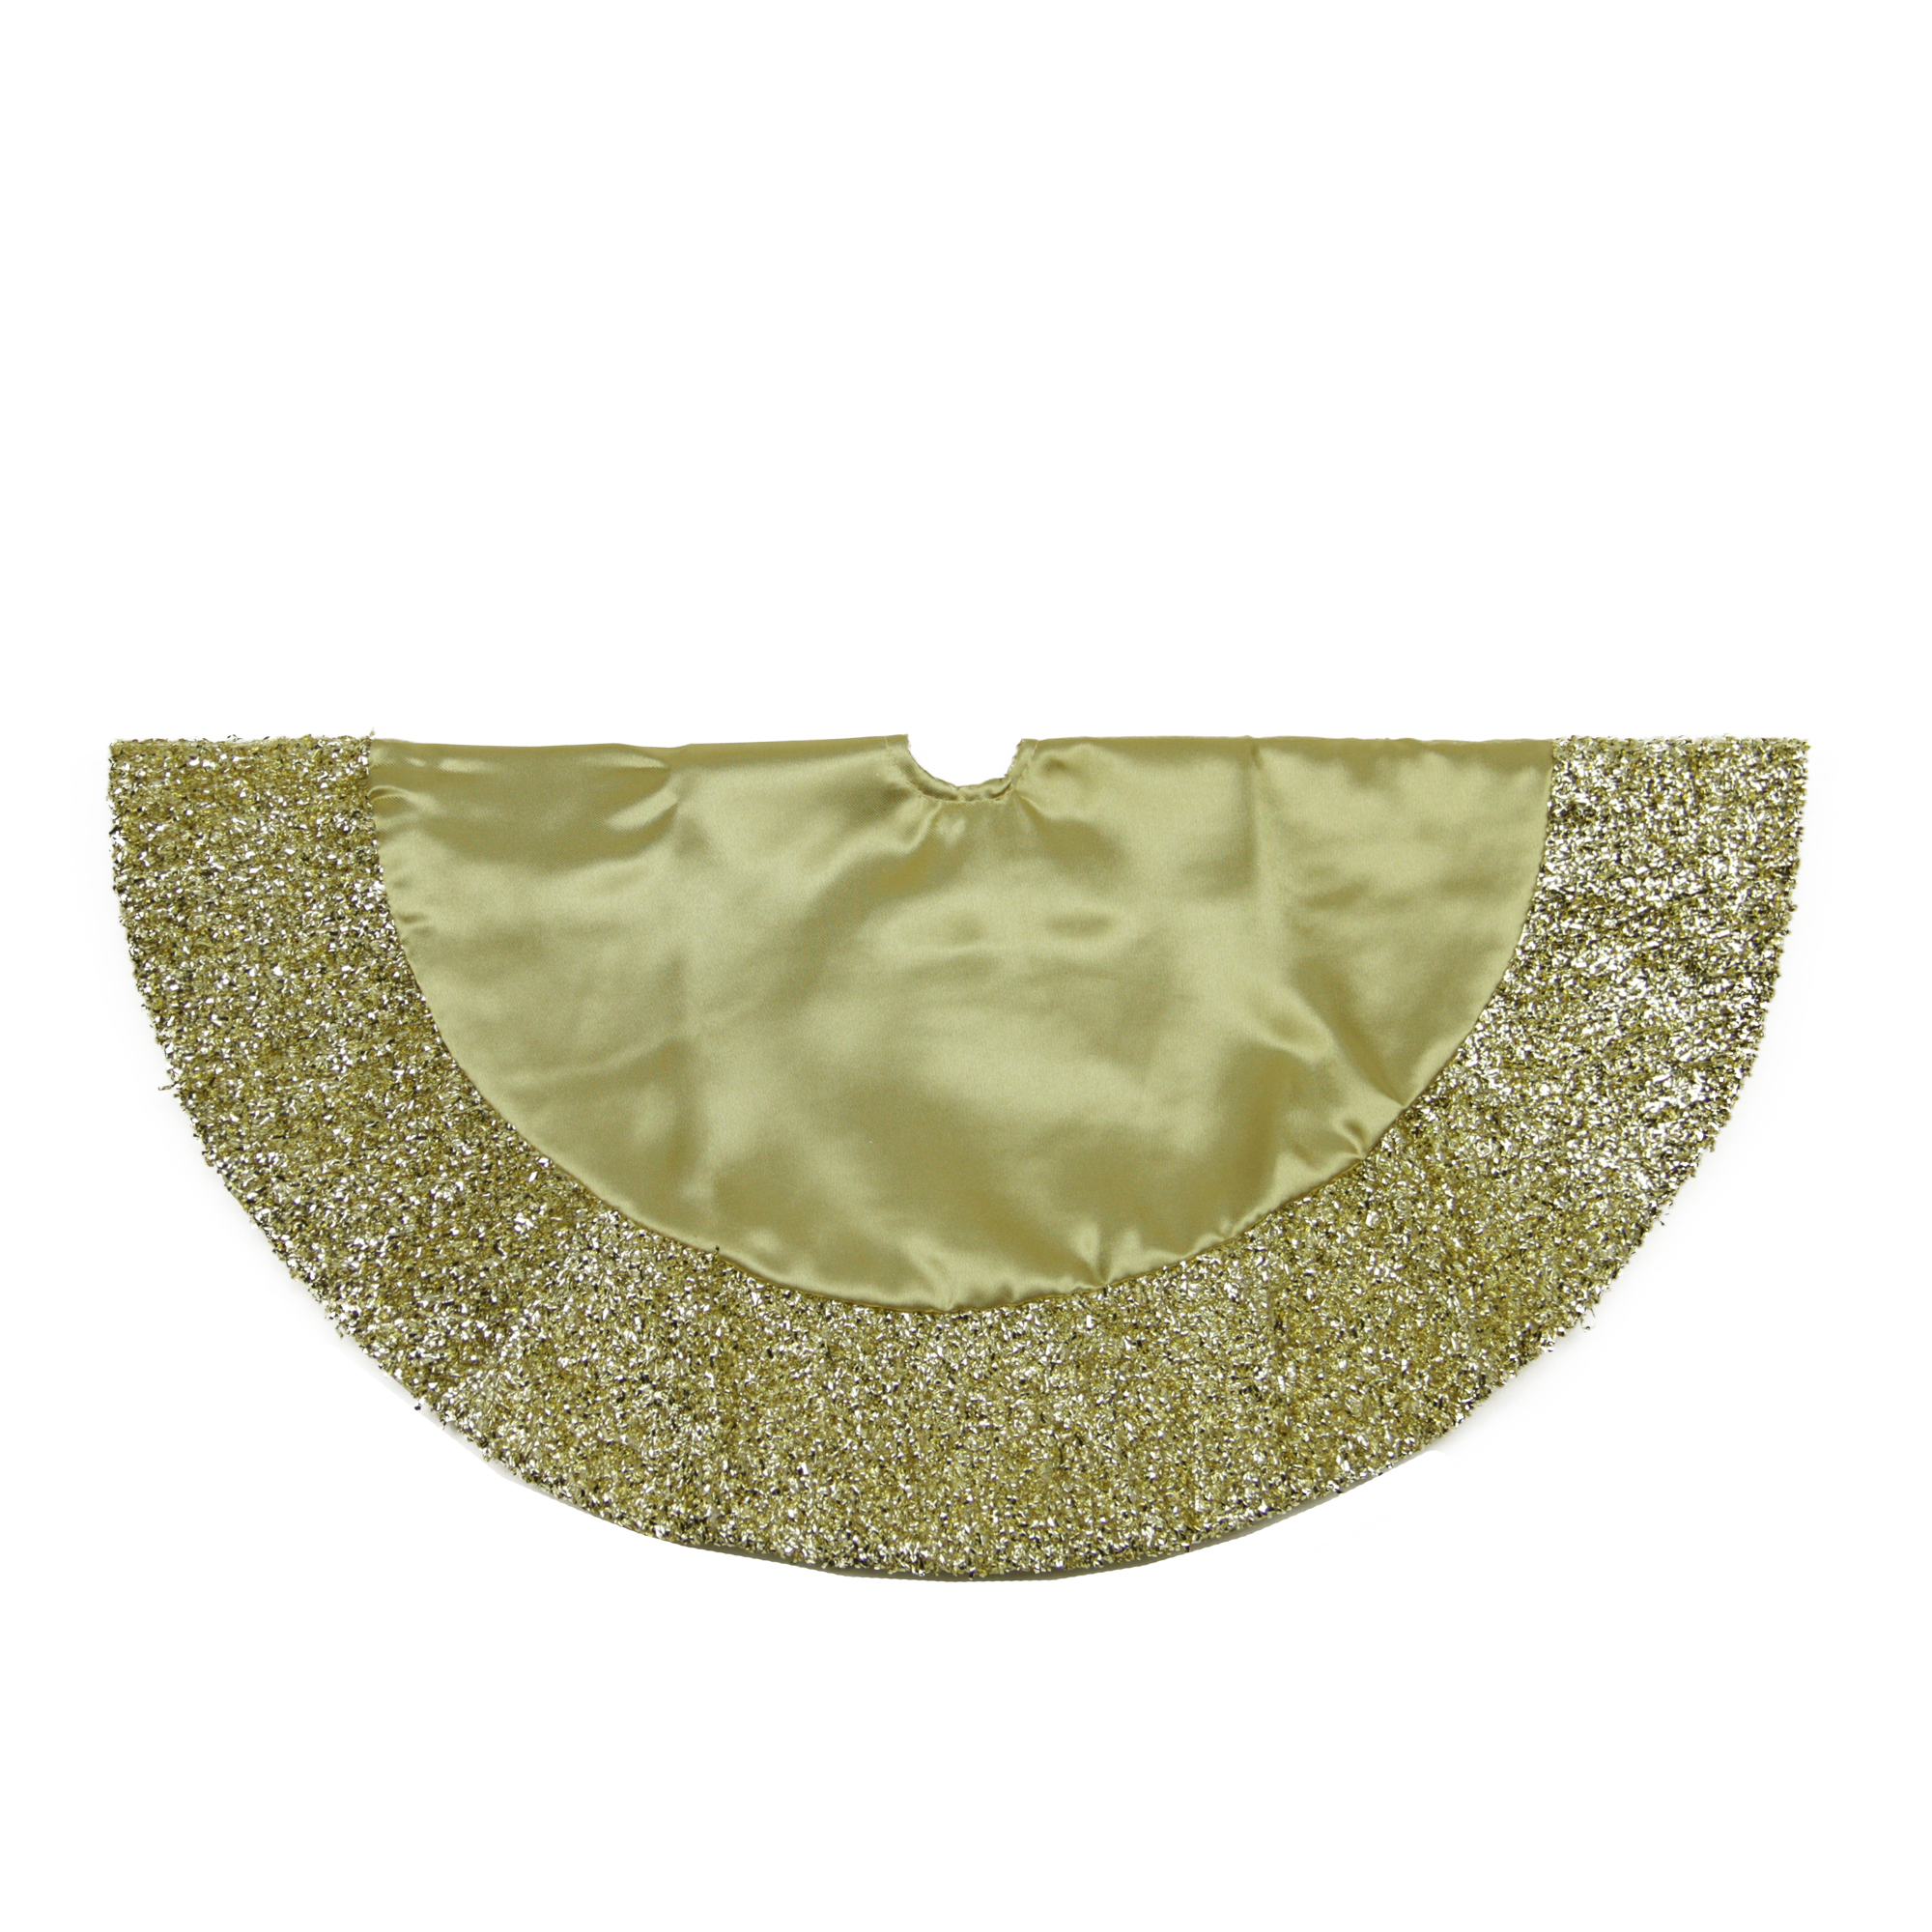 20 Gold Satin Mini Christmas Tree Skirt with Metallic Trim